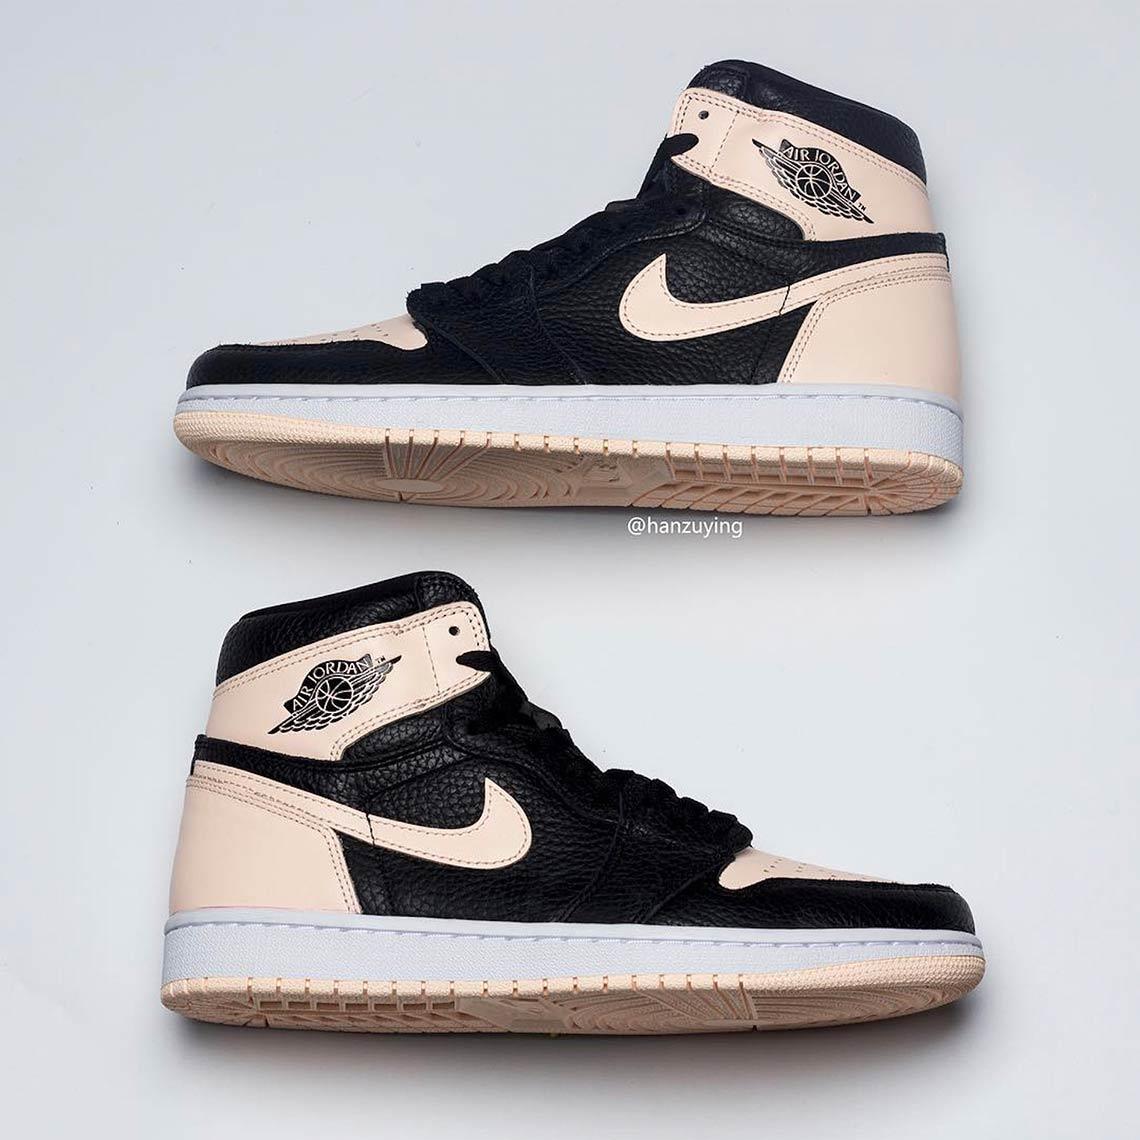 pretty nice 1526b 8af16 Jordan 1 Retro High OG Crimson Tint Release Date   SneakerNews.com